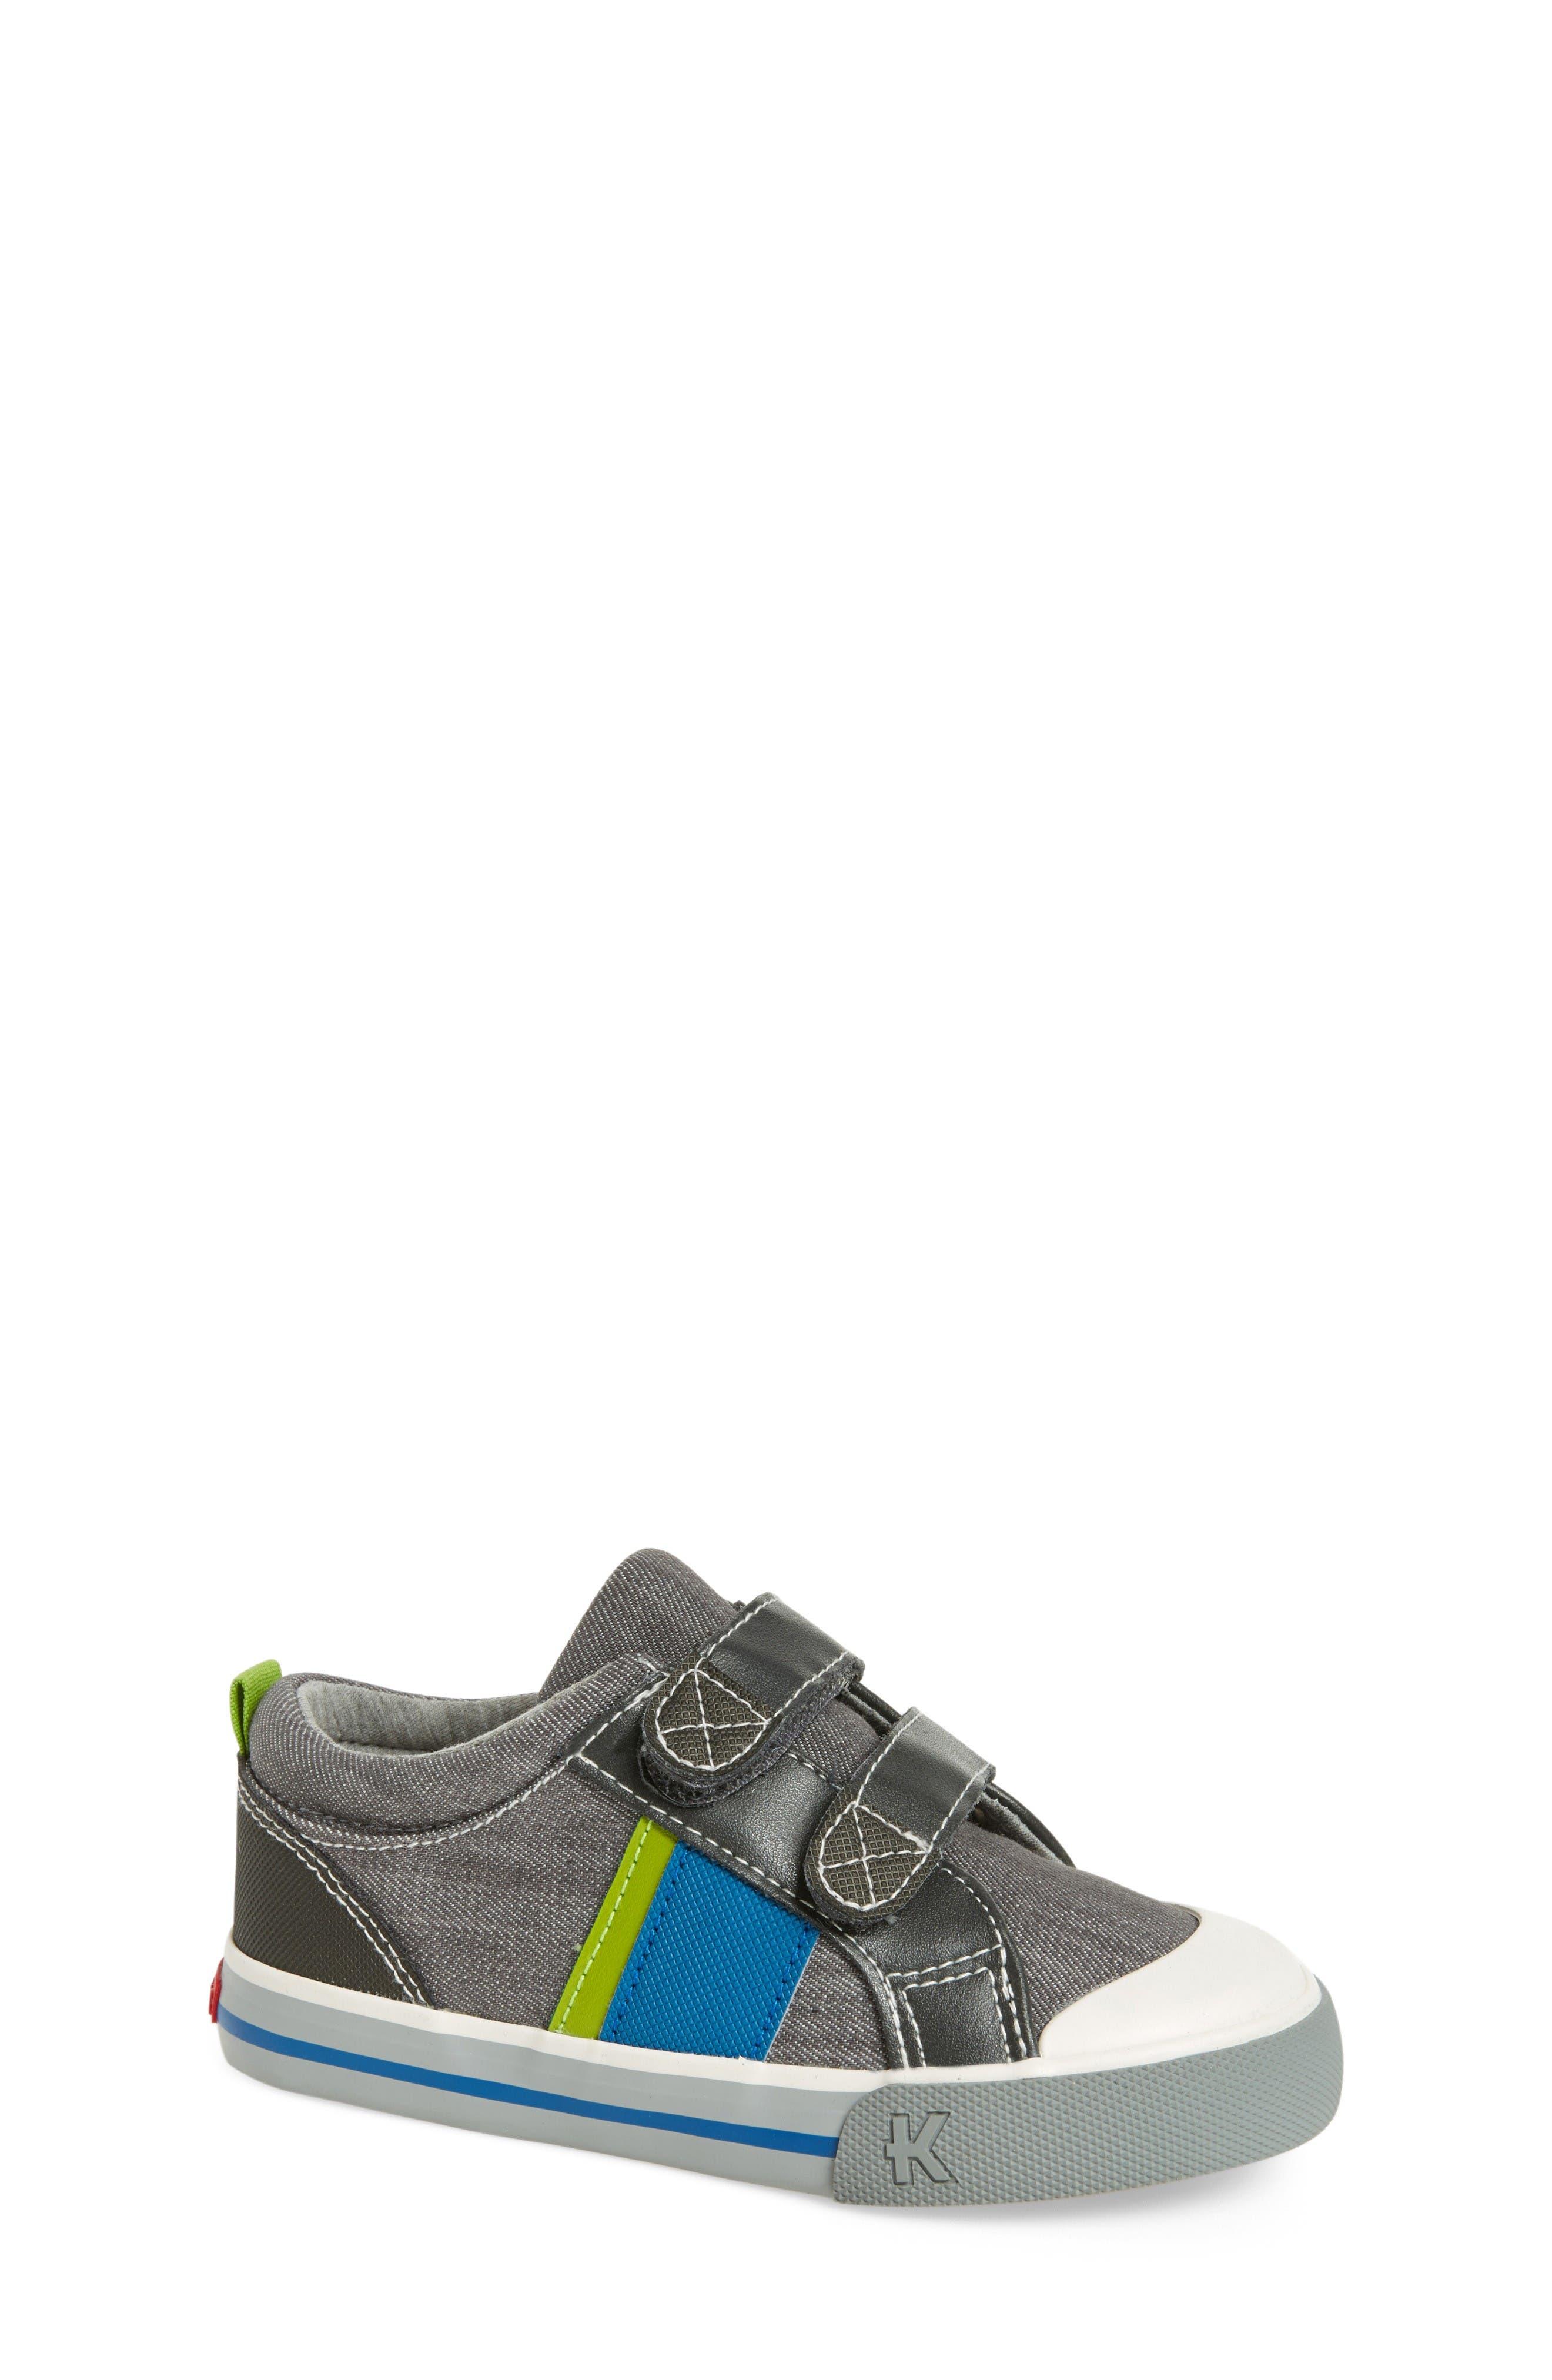 Russell Sneaker,                             Main thumbnail 1, color,                             Grey Denim